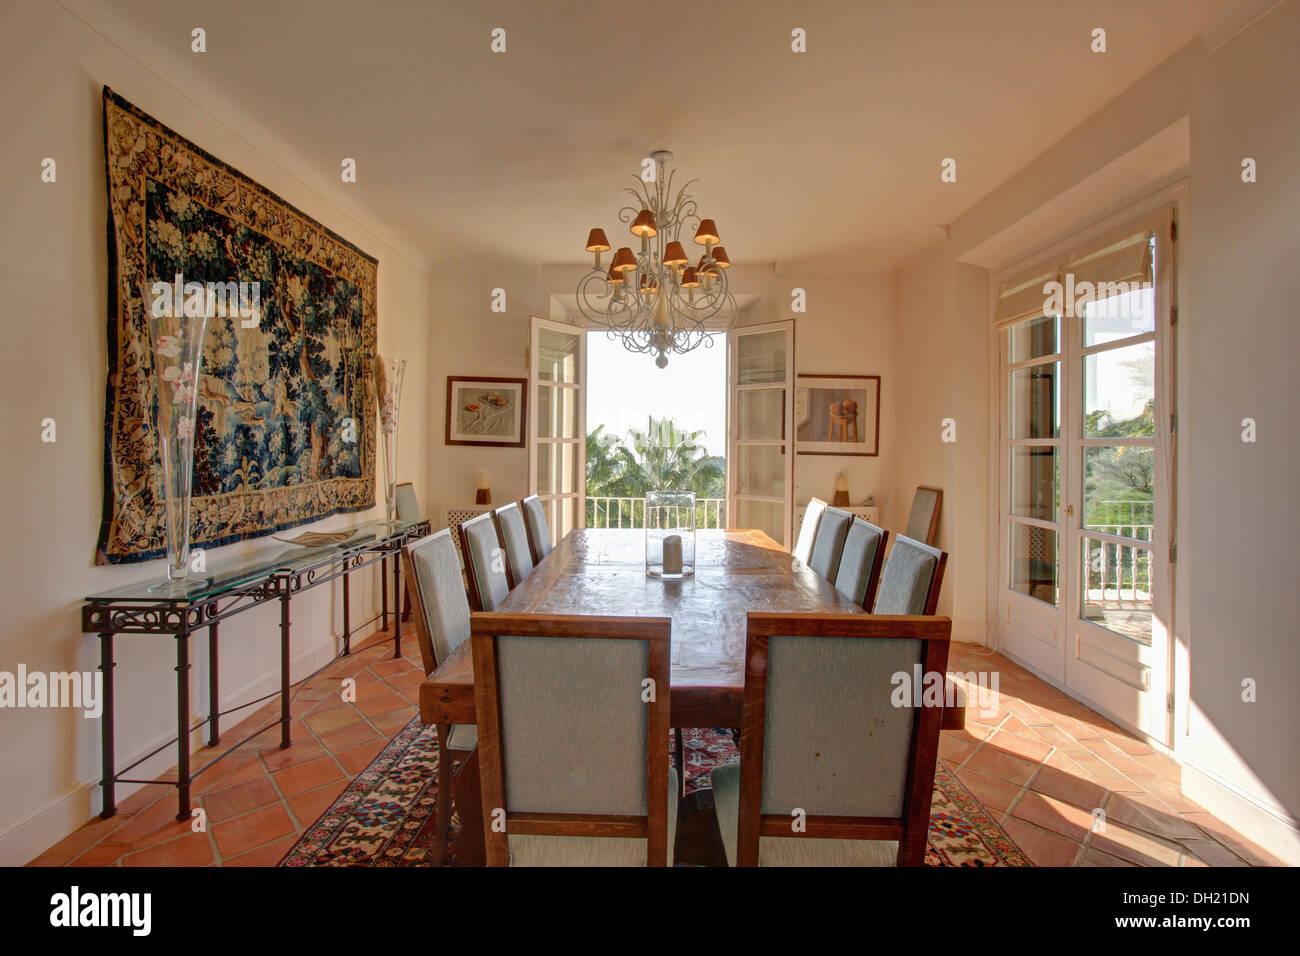 tapestries room stockfotos tapestries room bilder alamy. Black Bedroom Furniture Sets. Home Design Ideas